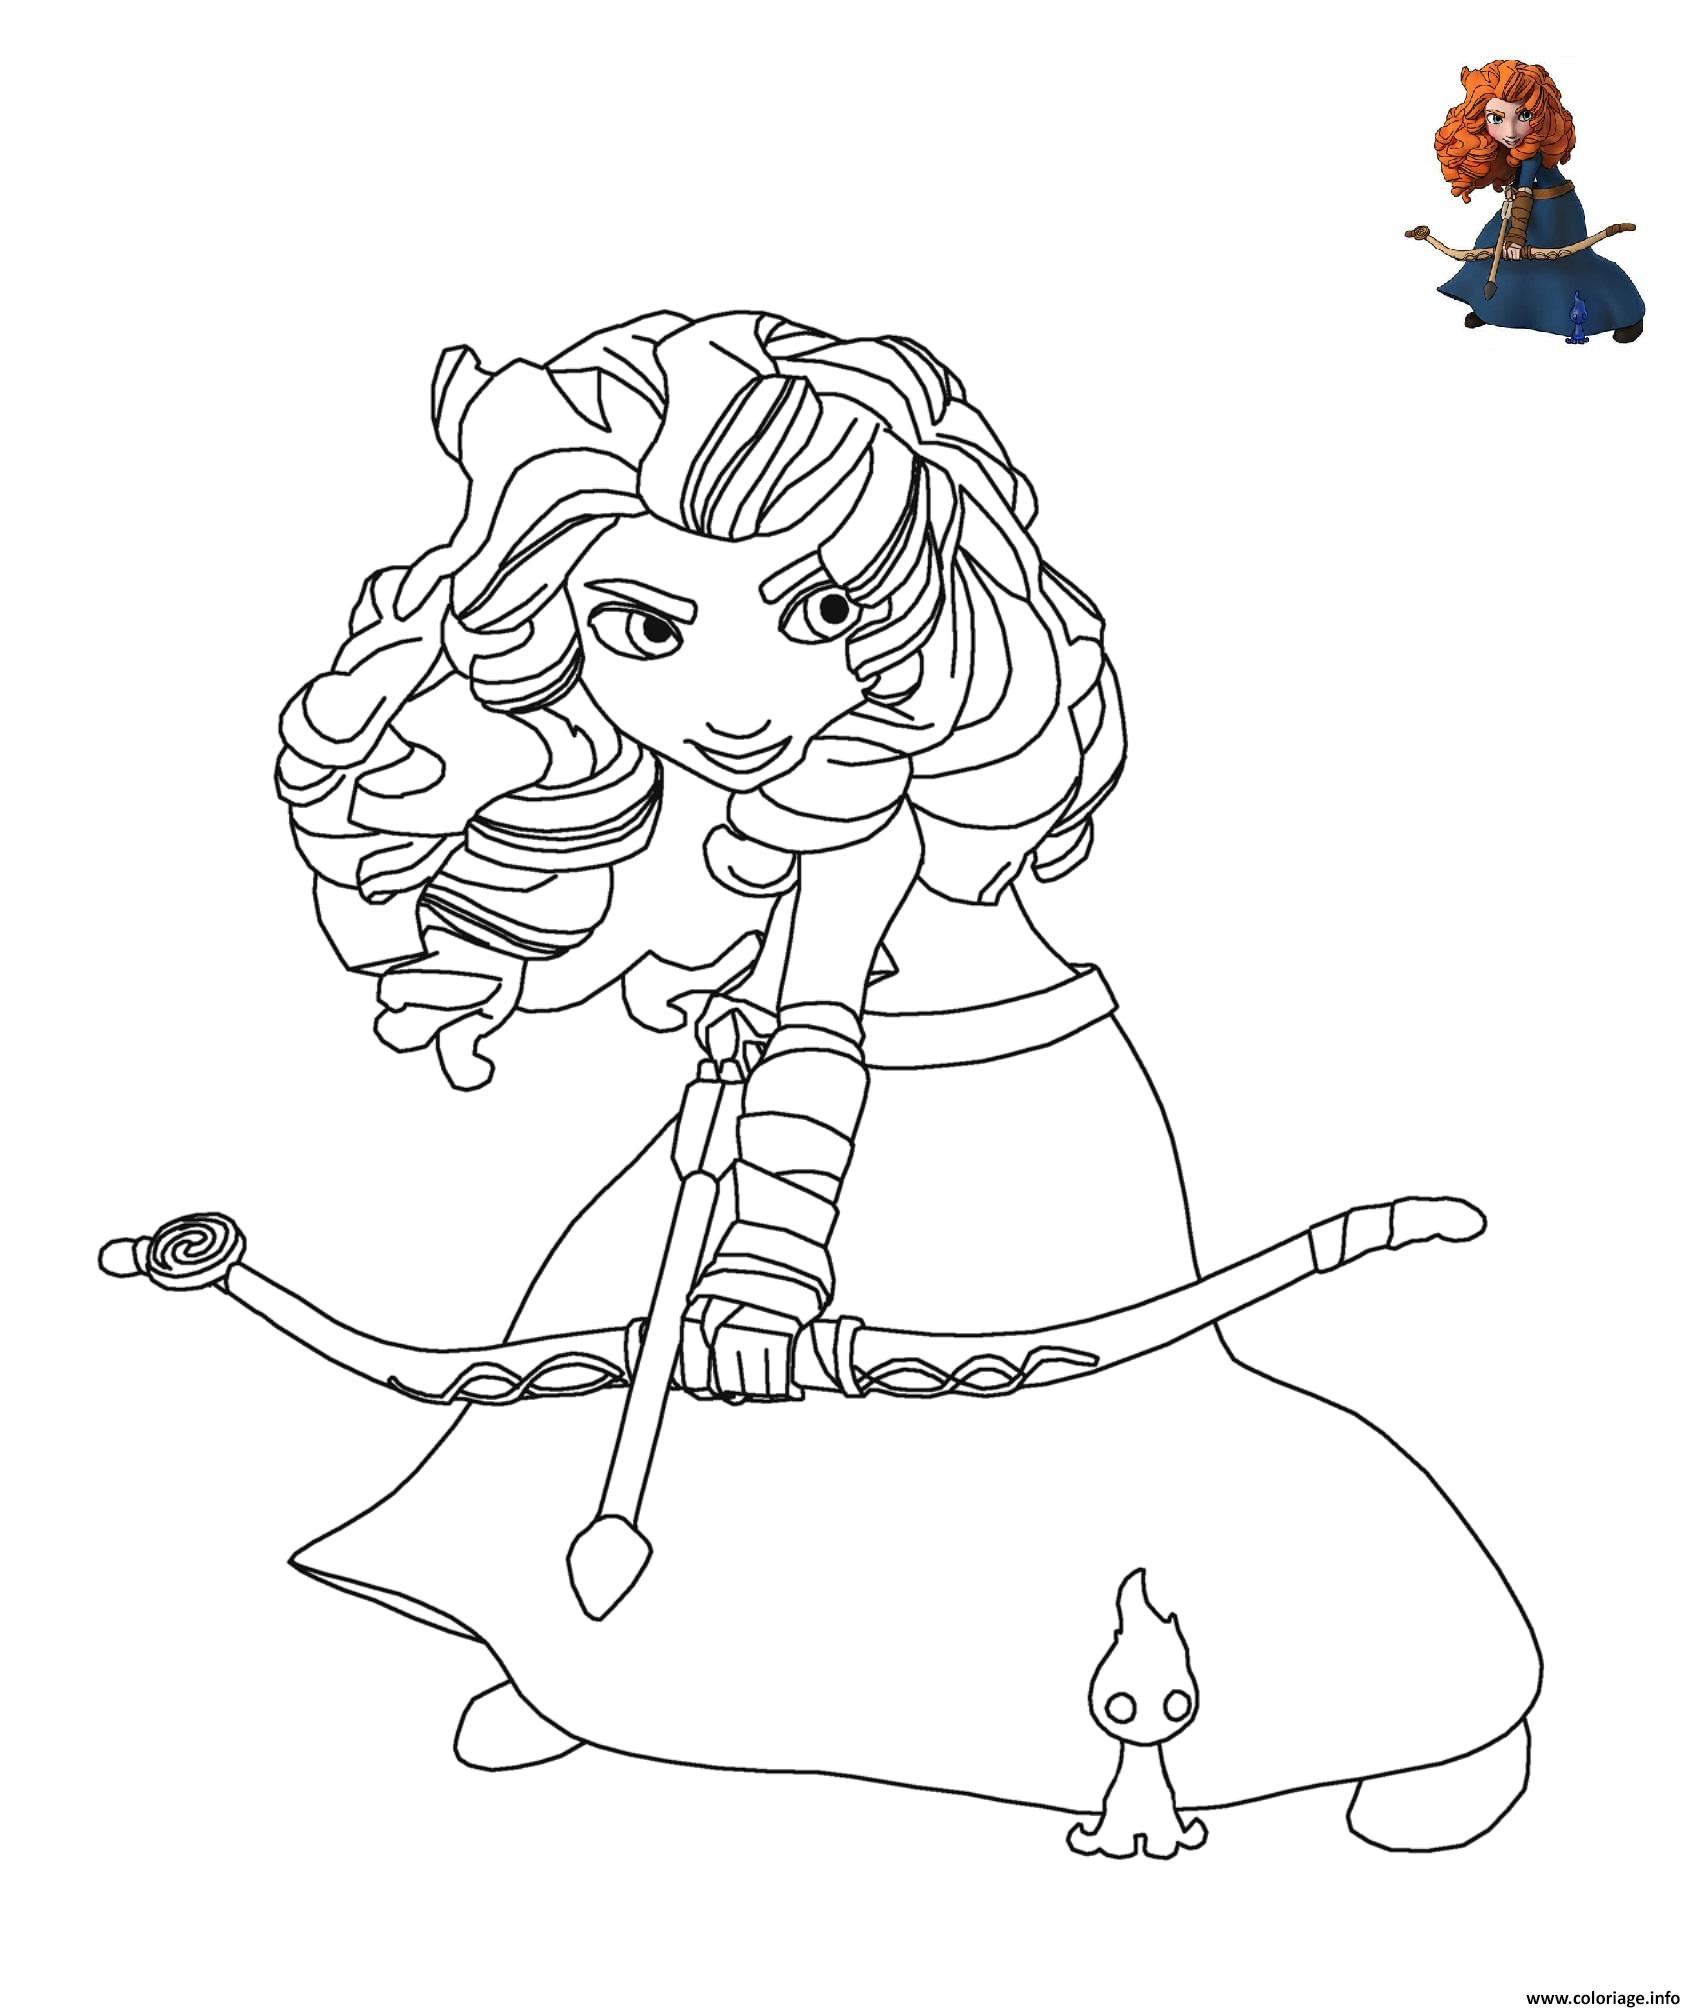 Coloriage Merida La Princesse Rebelle De Disney Dessin à Dessin De Rebelle